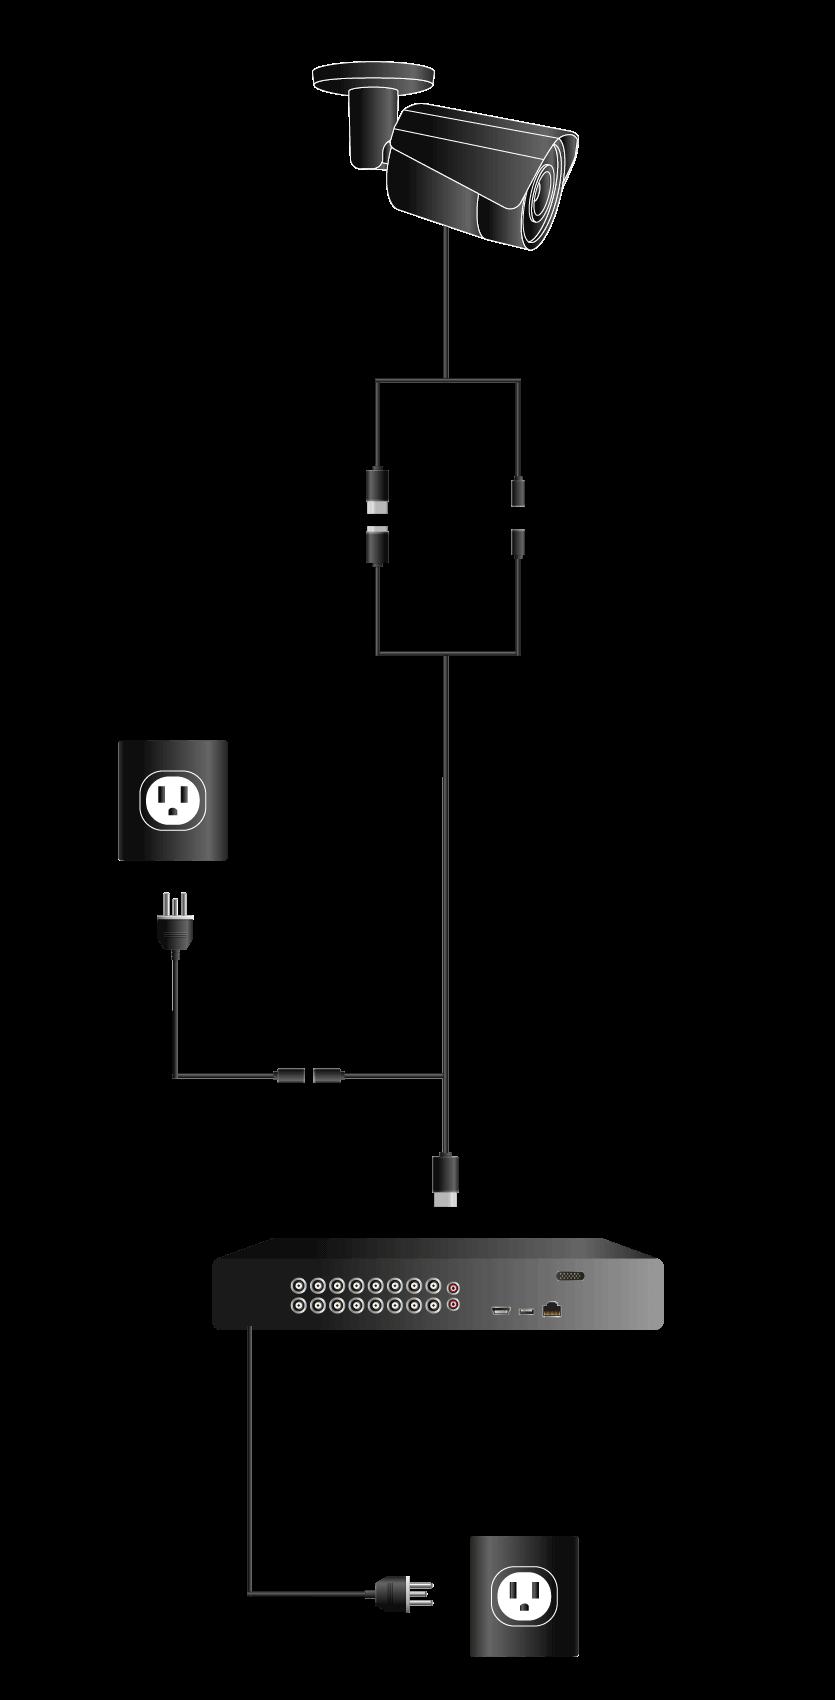 How To Install Security Cameras